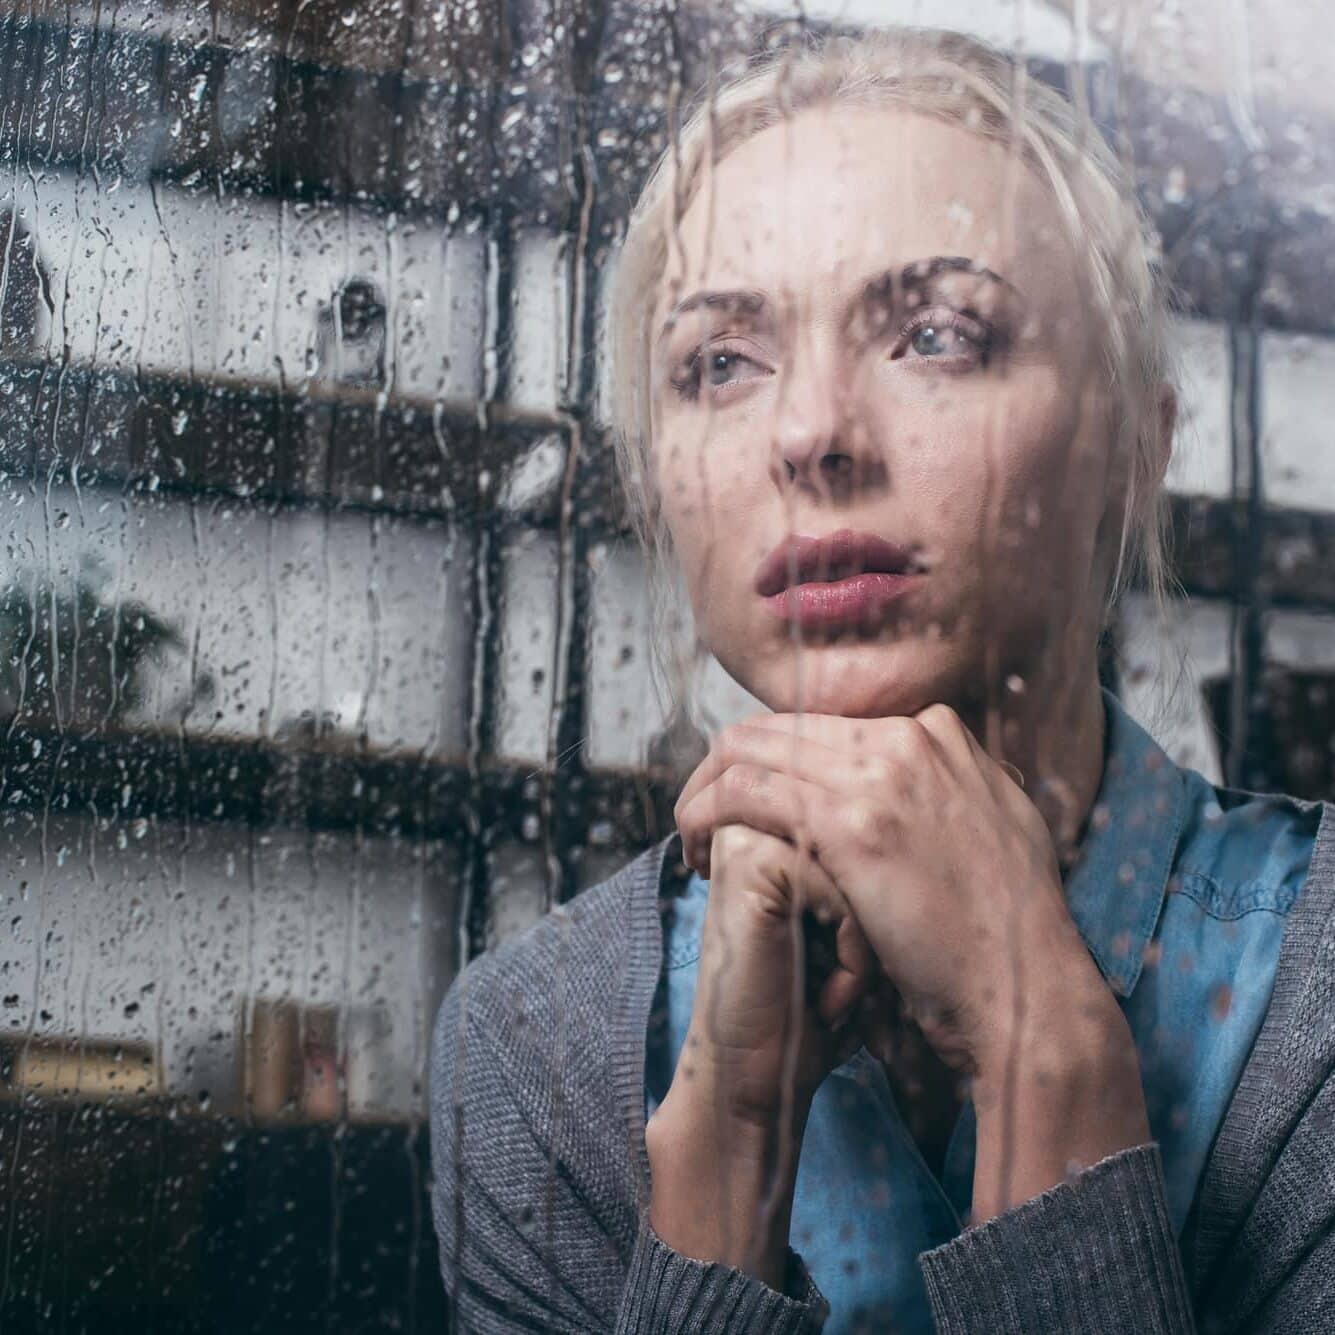 Women looking out rainy window